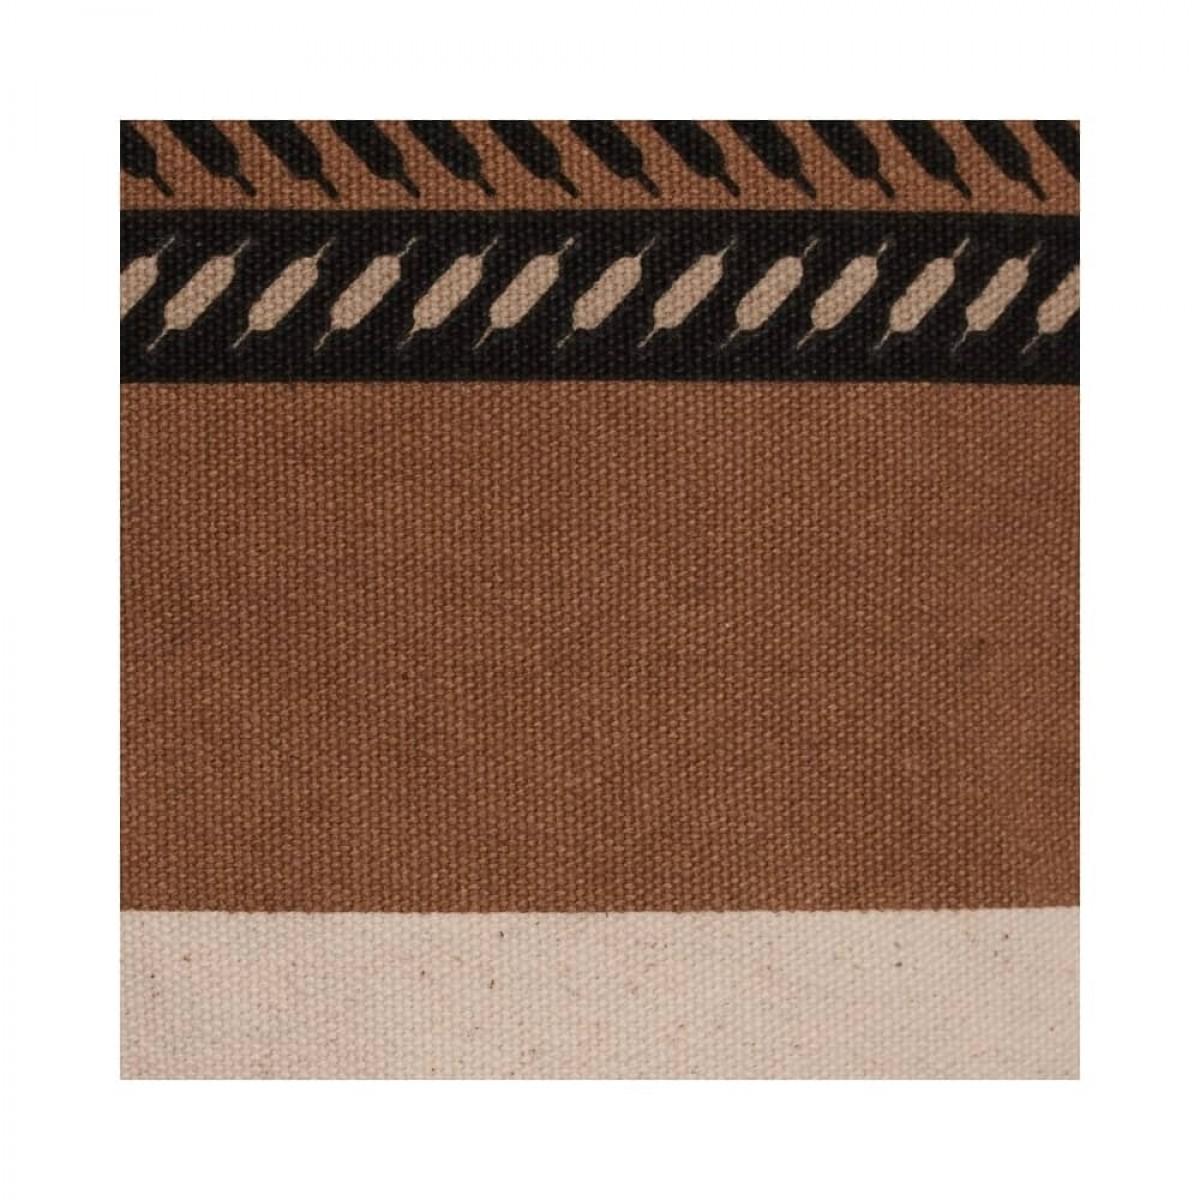 crossbody eli colored - kufiya hessian dune - print